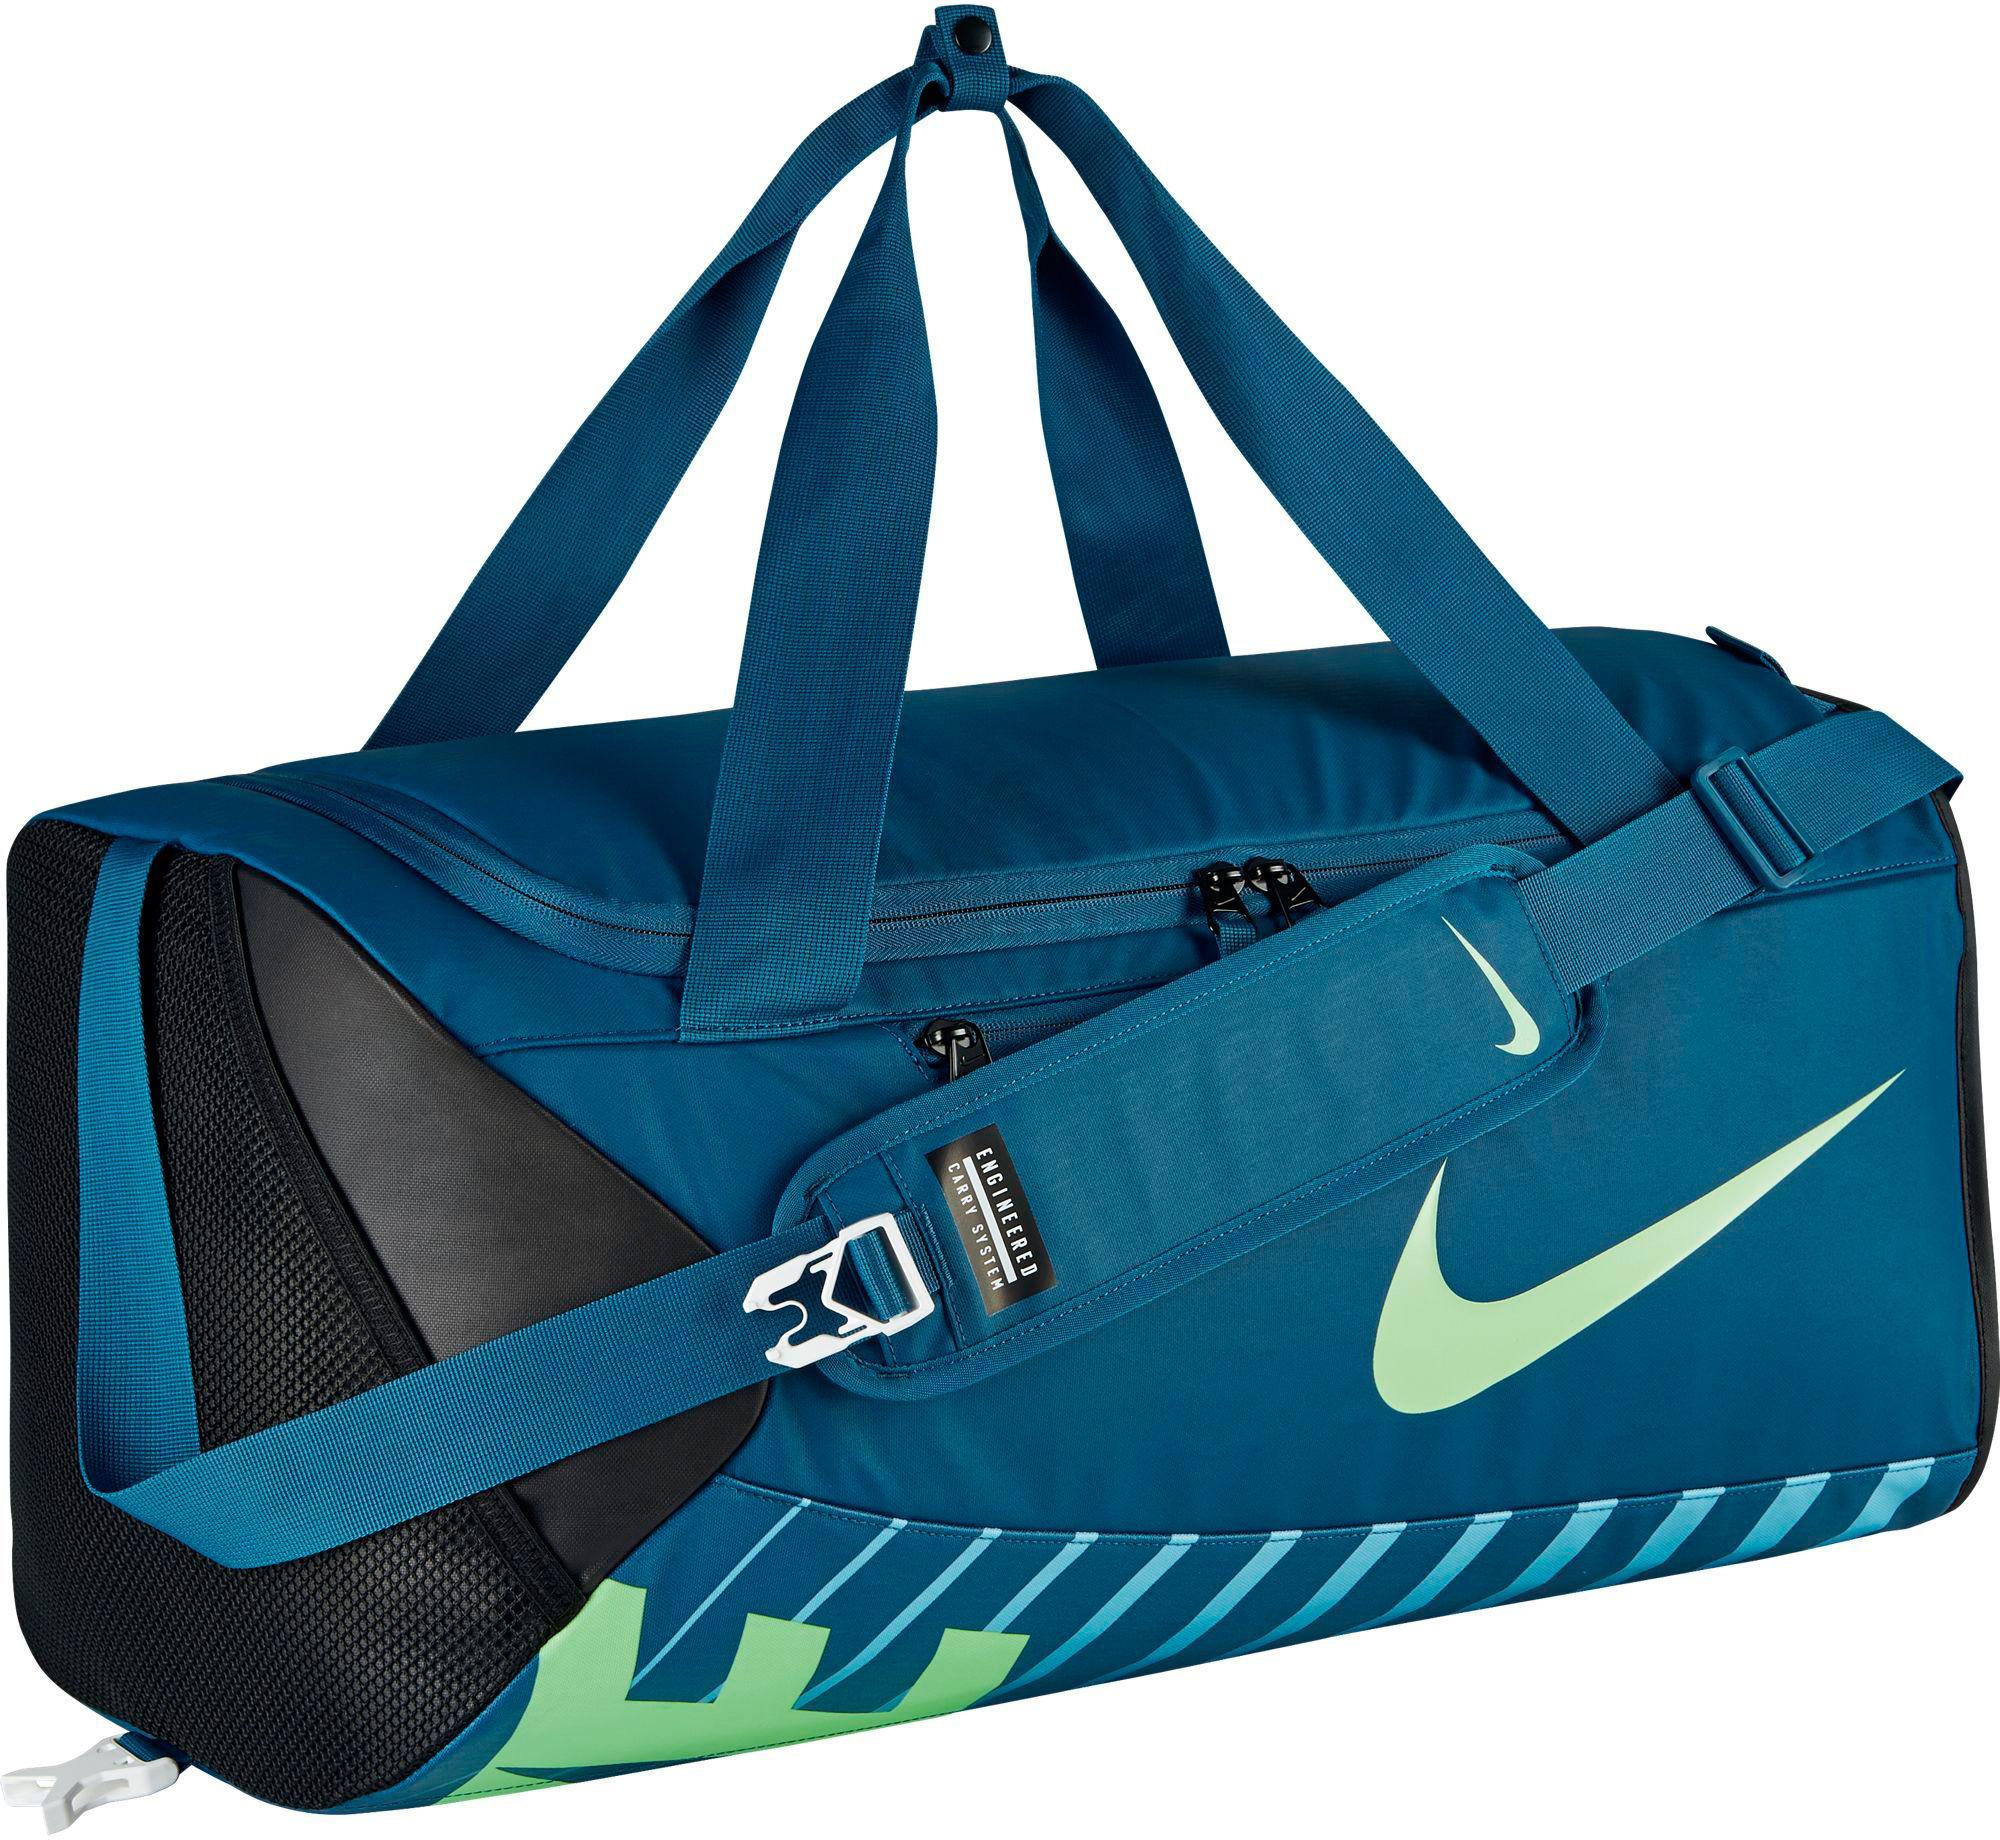 ee48ed9e03 Lyst - Nike Alpha Adapt Medium Crossbody Duffle Bag in Blue for Men